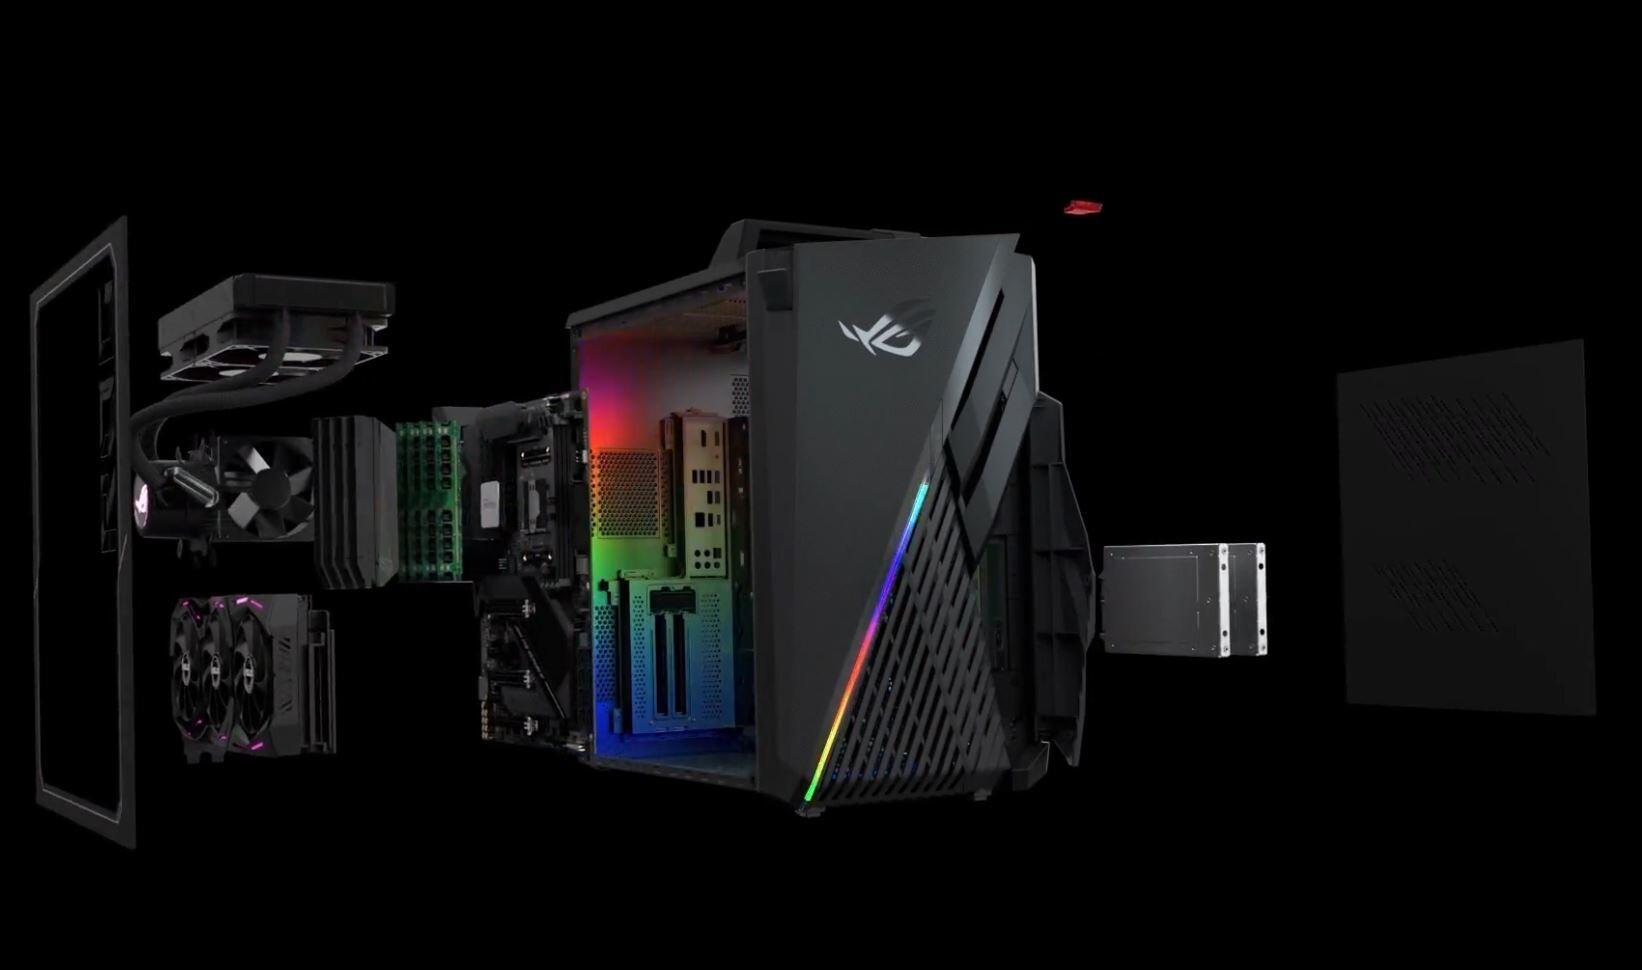 Asus Jodohkan AMD Ryzen 9 dan NVIDIA RTX 2080 Ti di PC Gaming